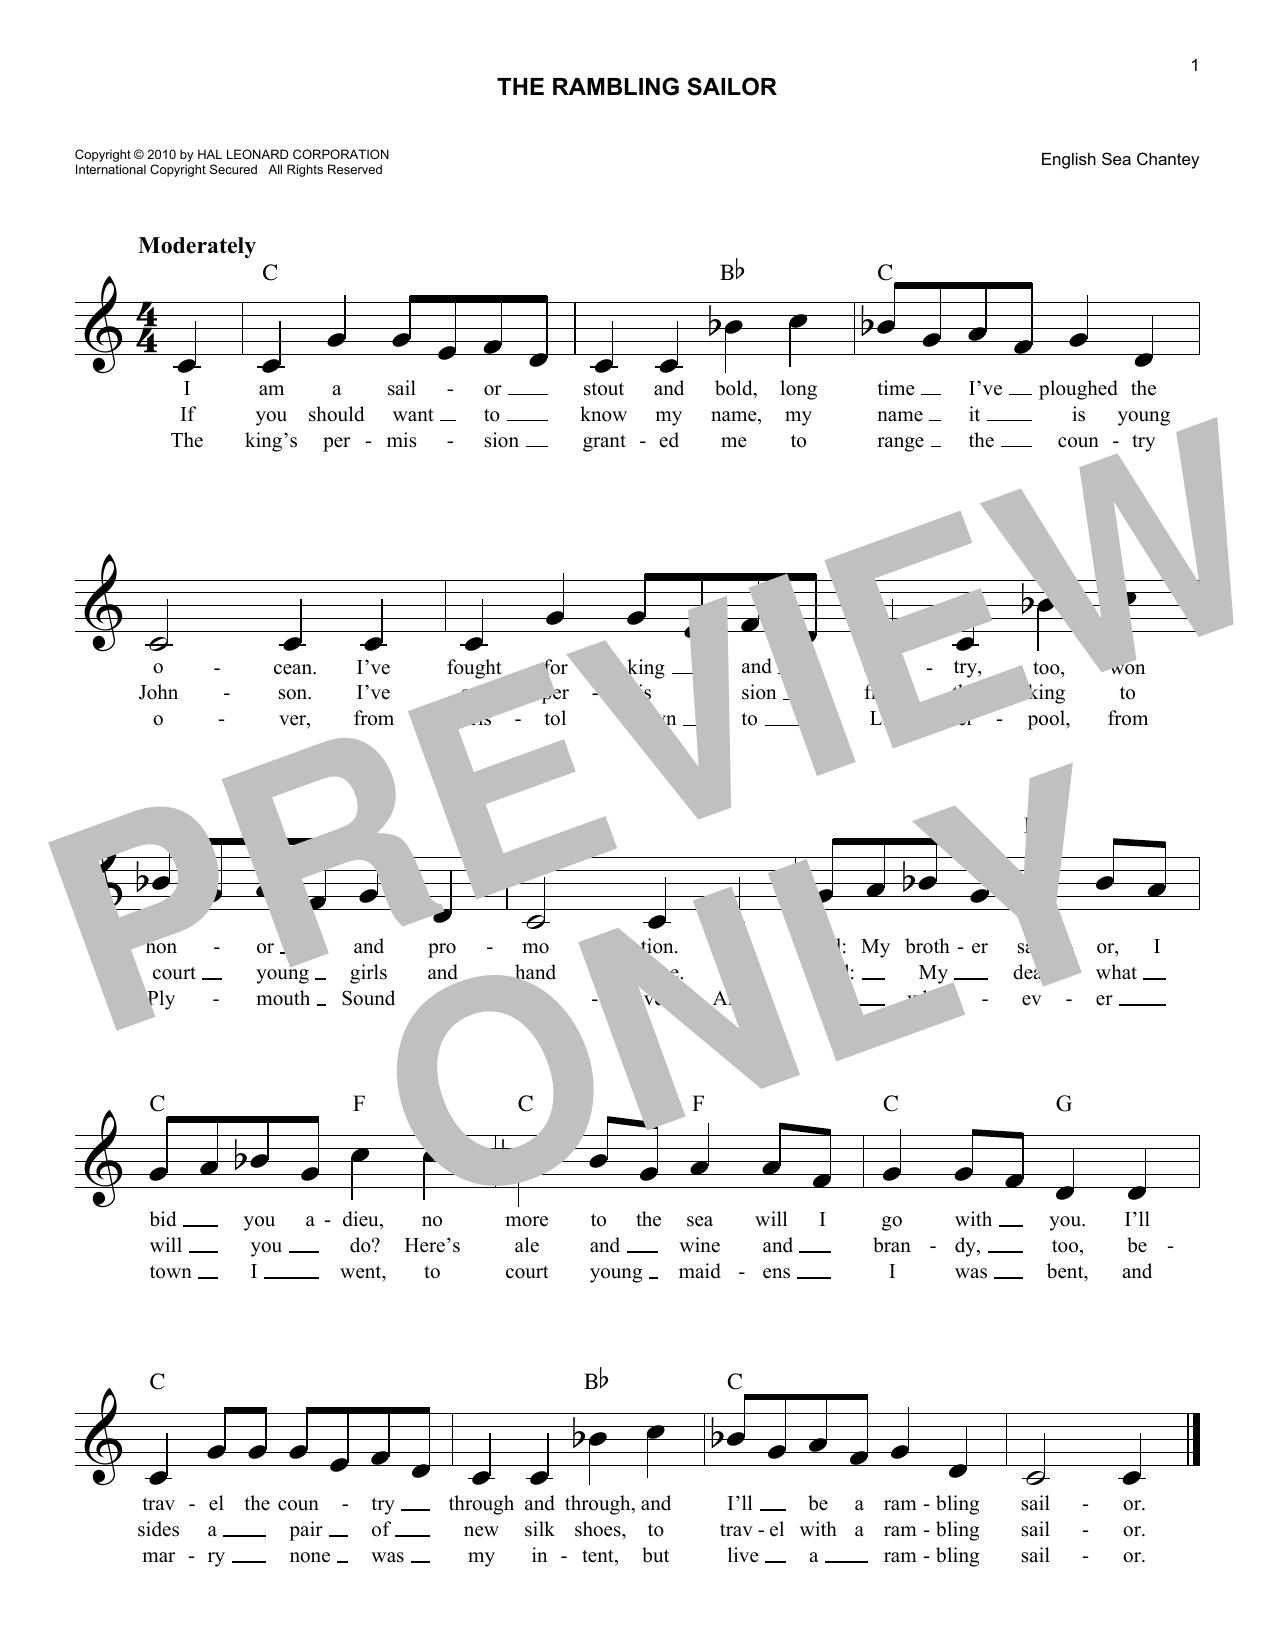 The Rambling Sailor Sheet Music